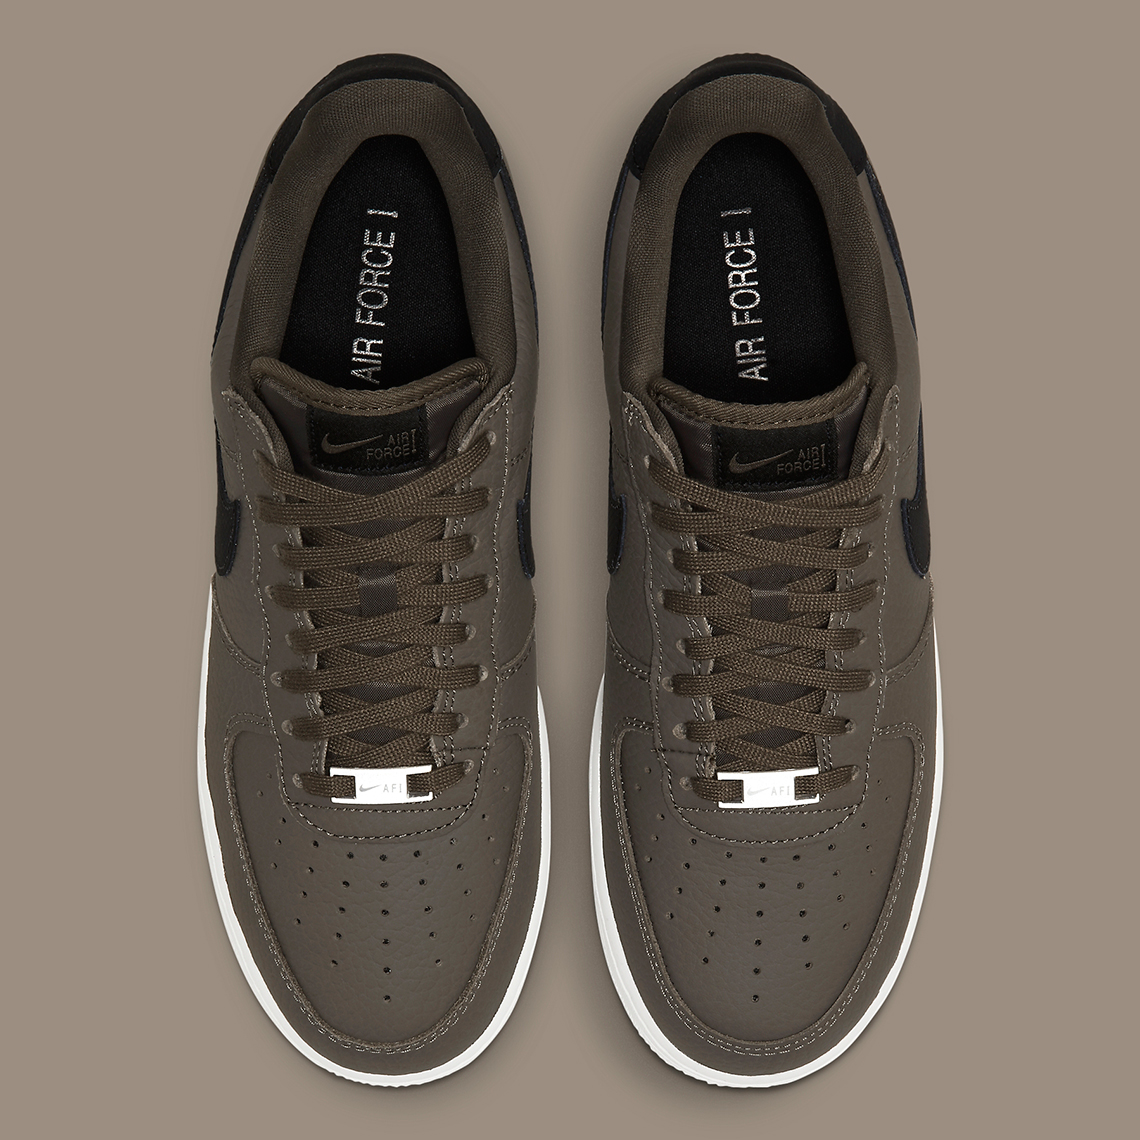 Nike Air Force 1 Craft Ridgerock CT2317